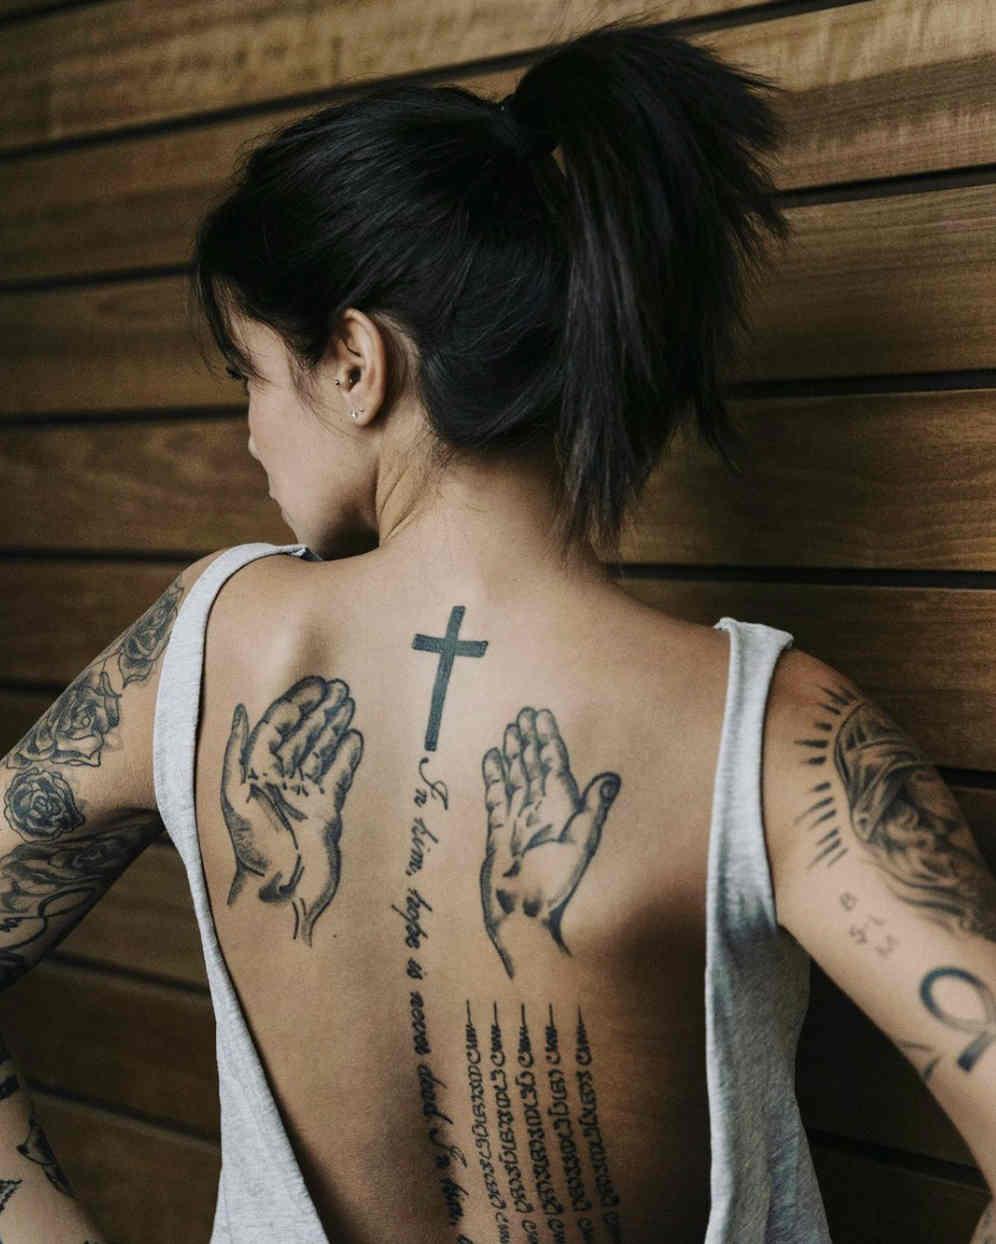 Marlen Valderrama-Alvaréz de espaldas mostrando su tatuaje religioso